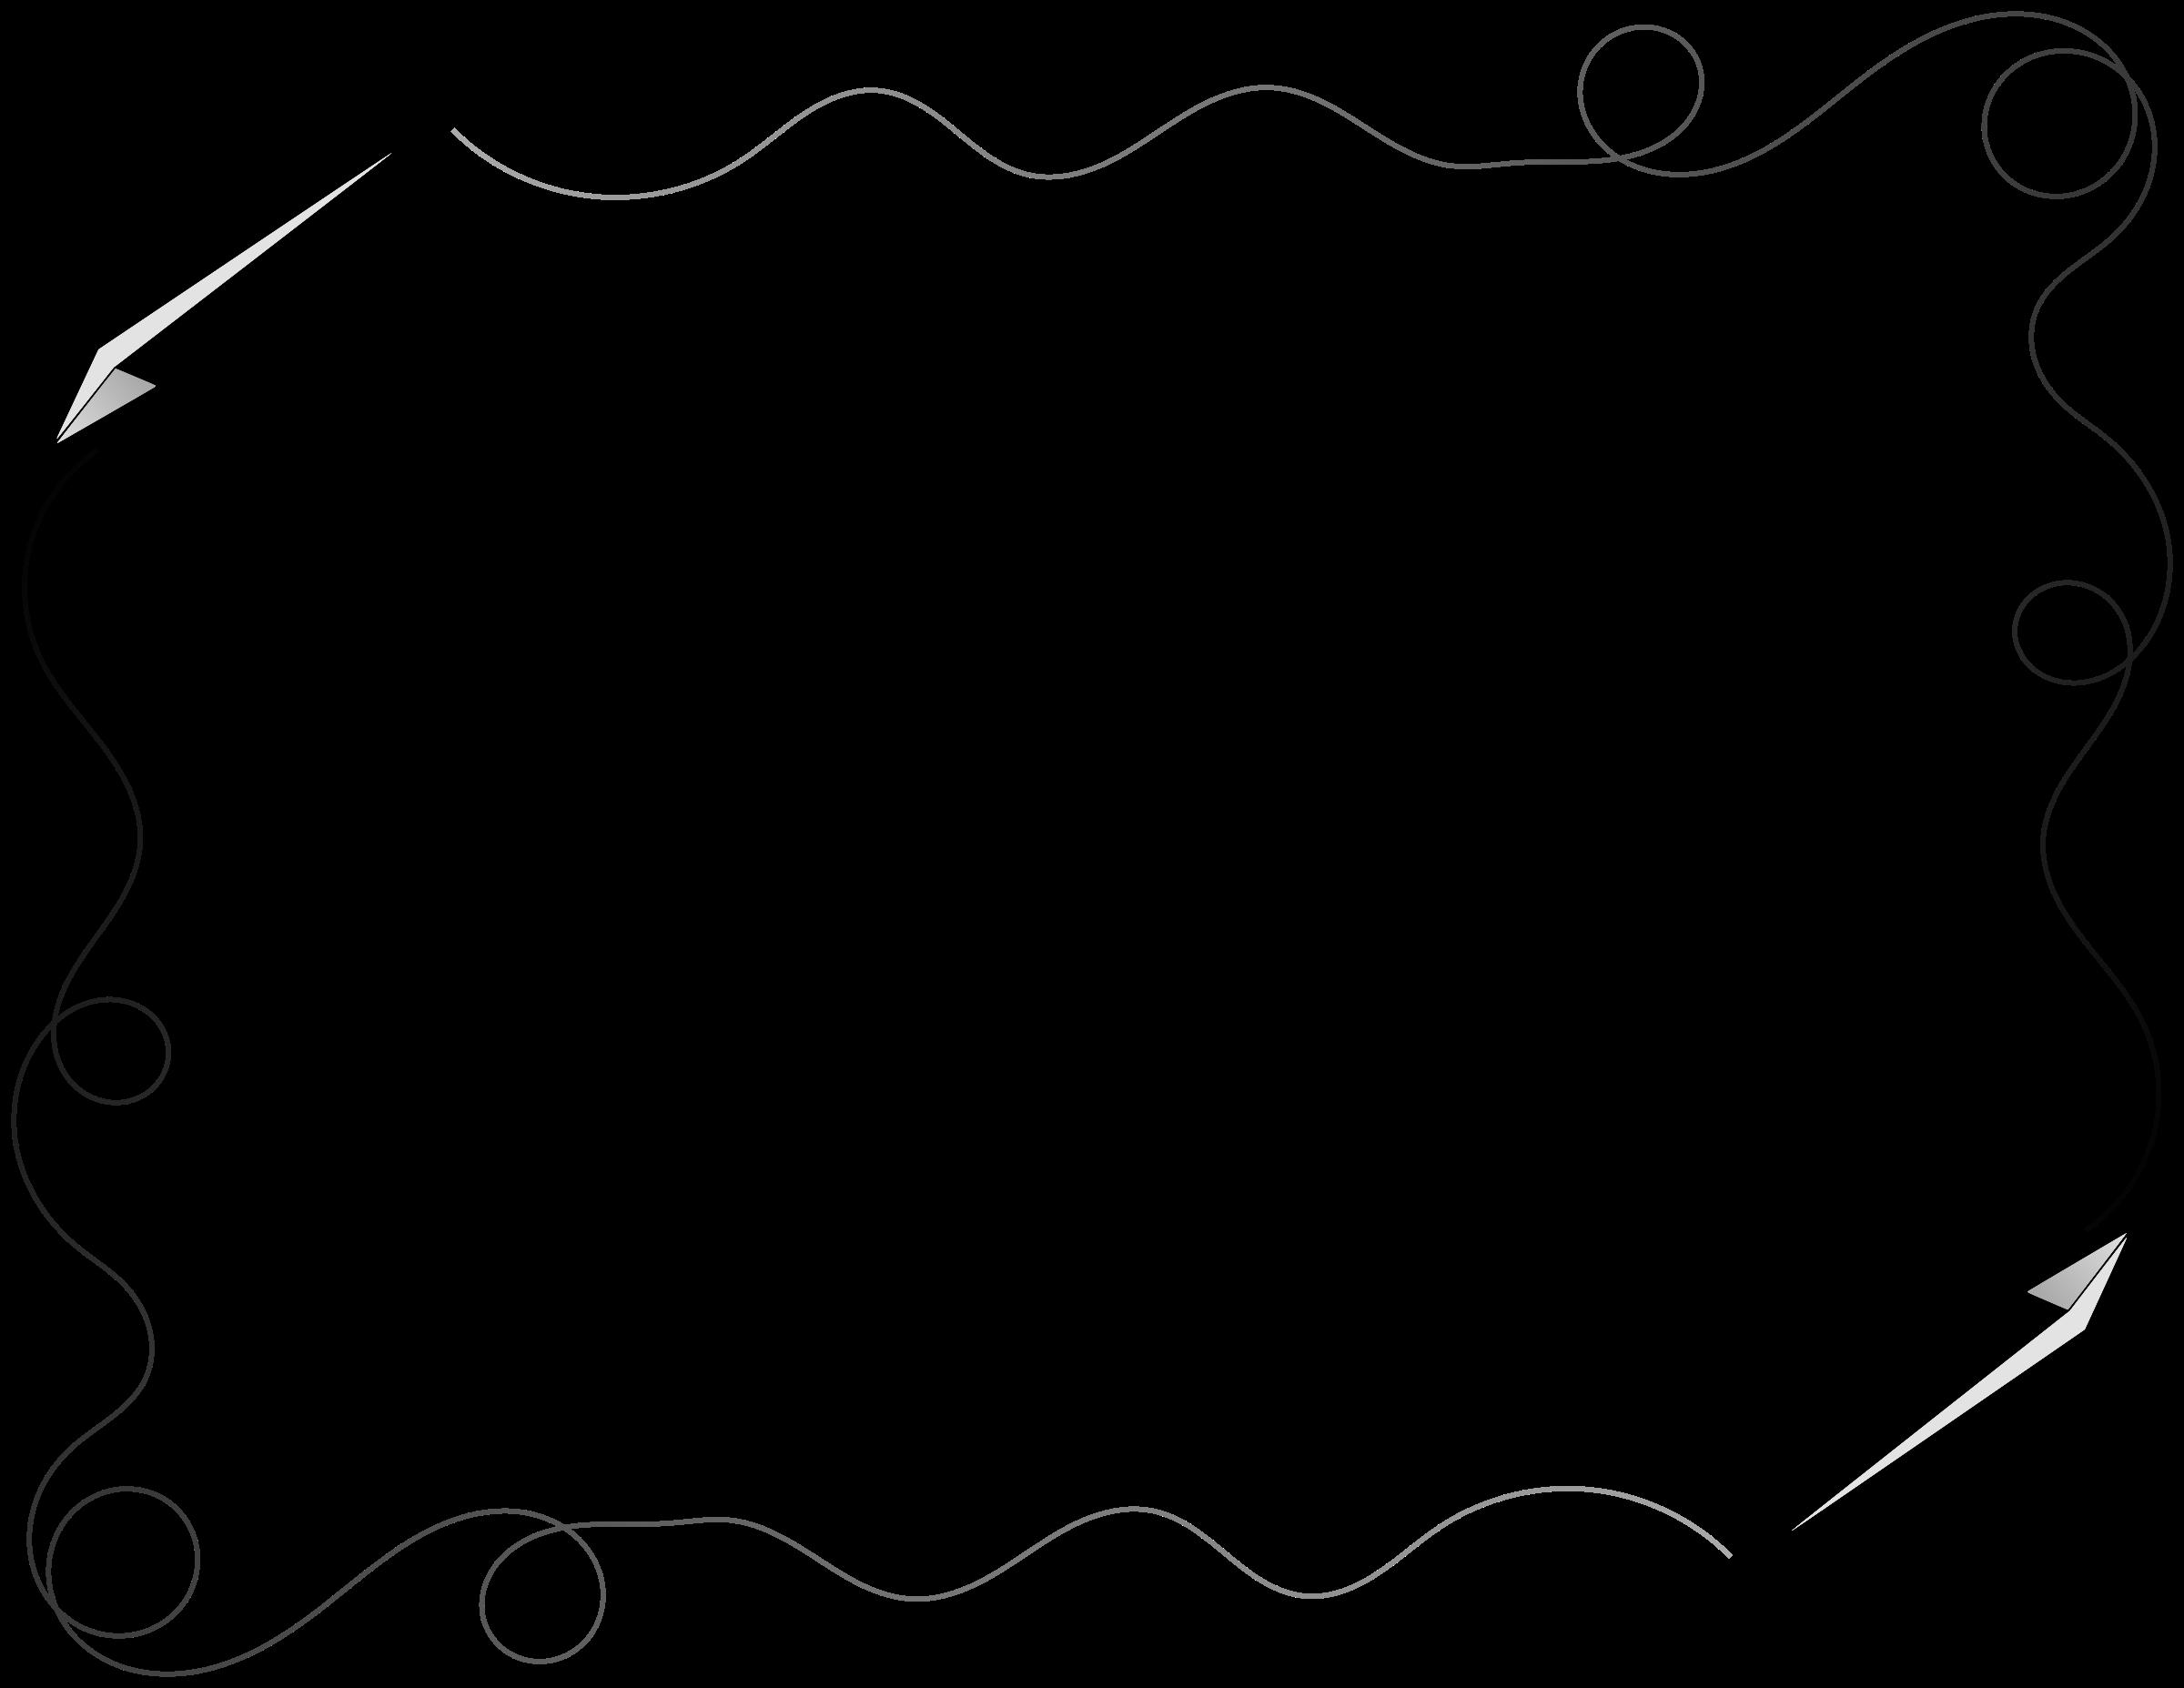 2400x1855 Free Airplane Border Clip Art